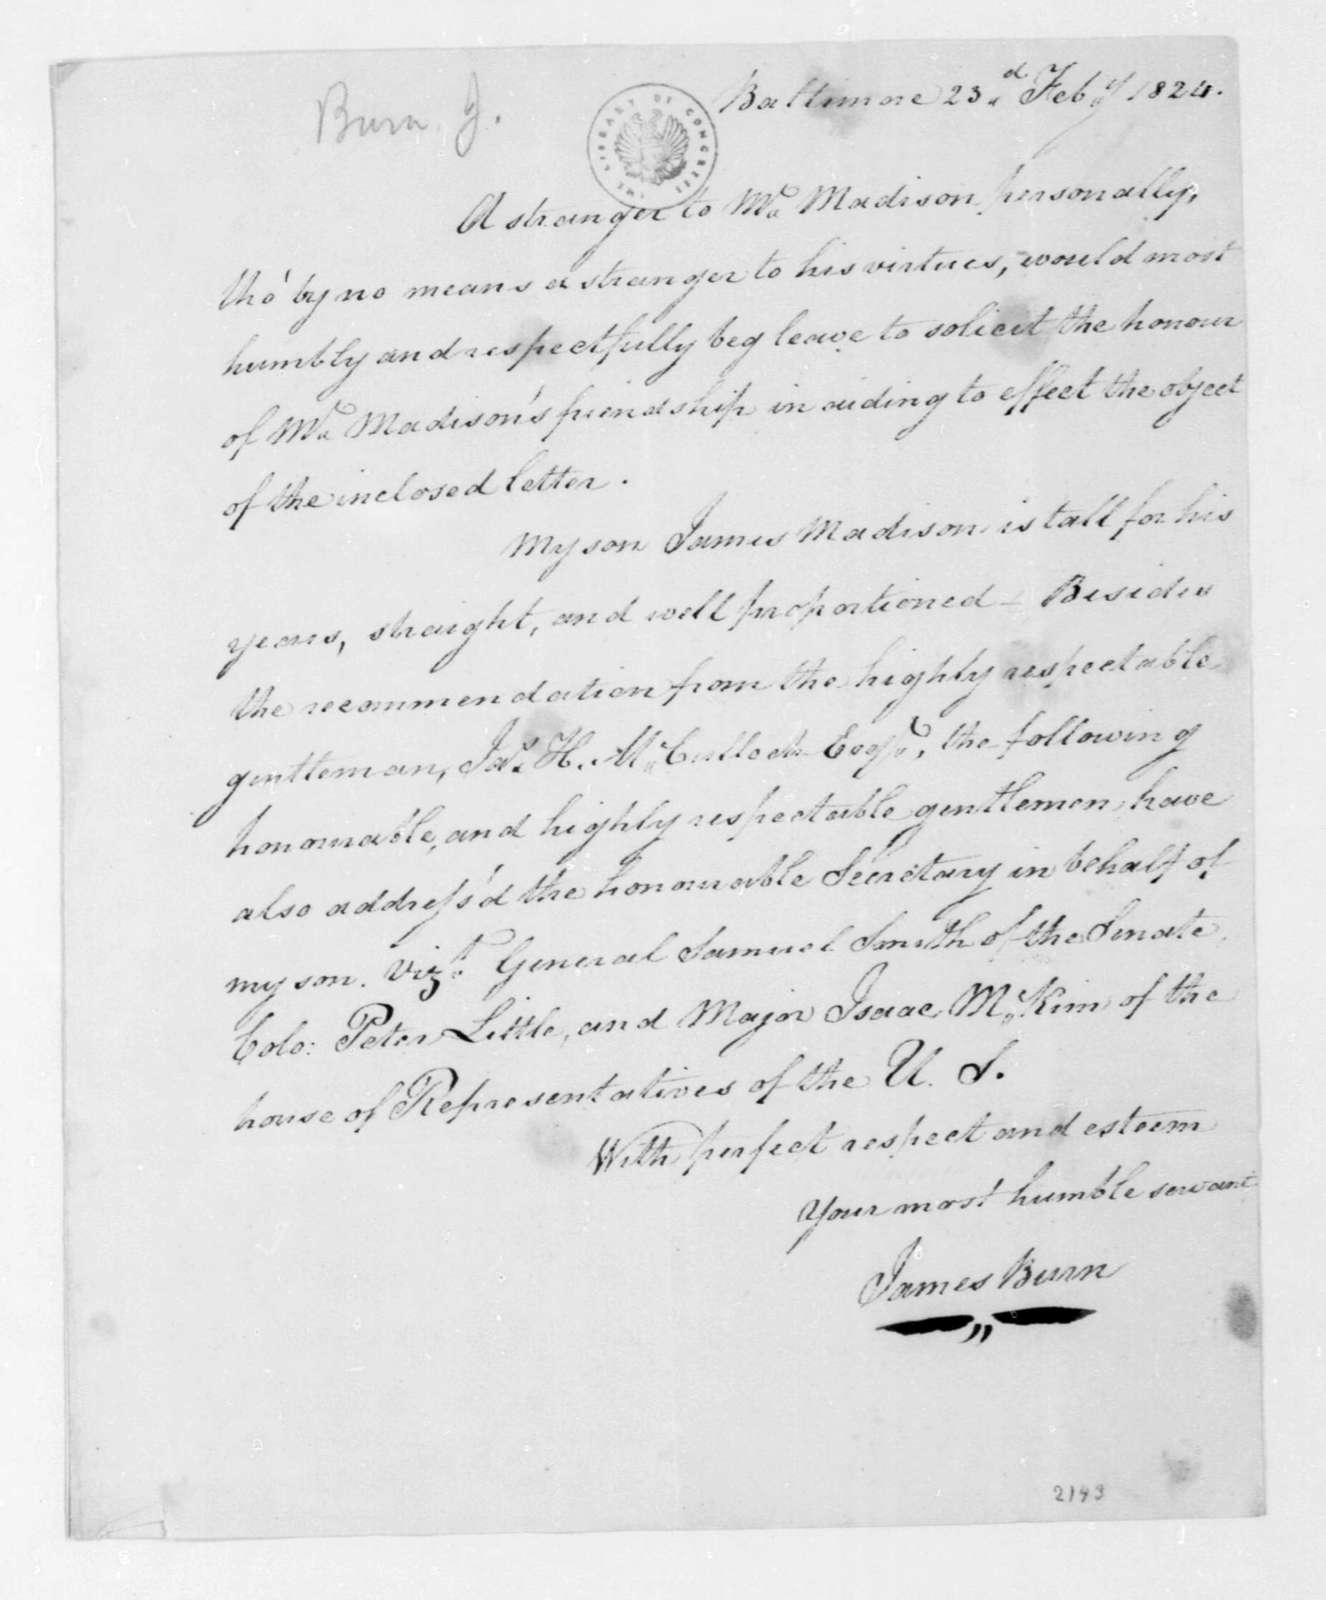 James Burn to James Madison, February 23, 1824.